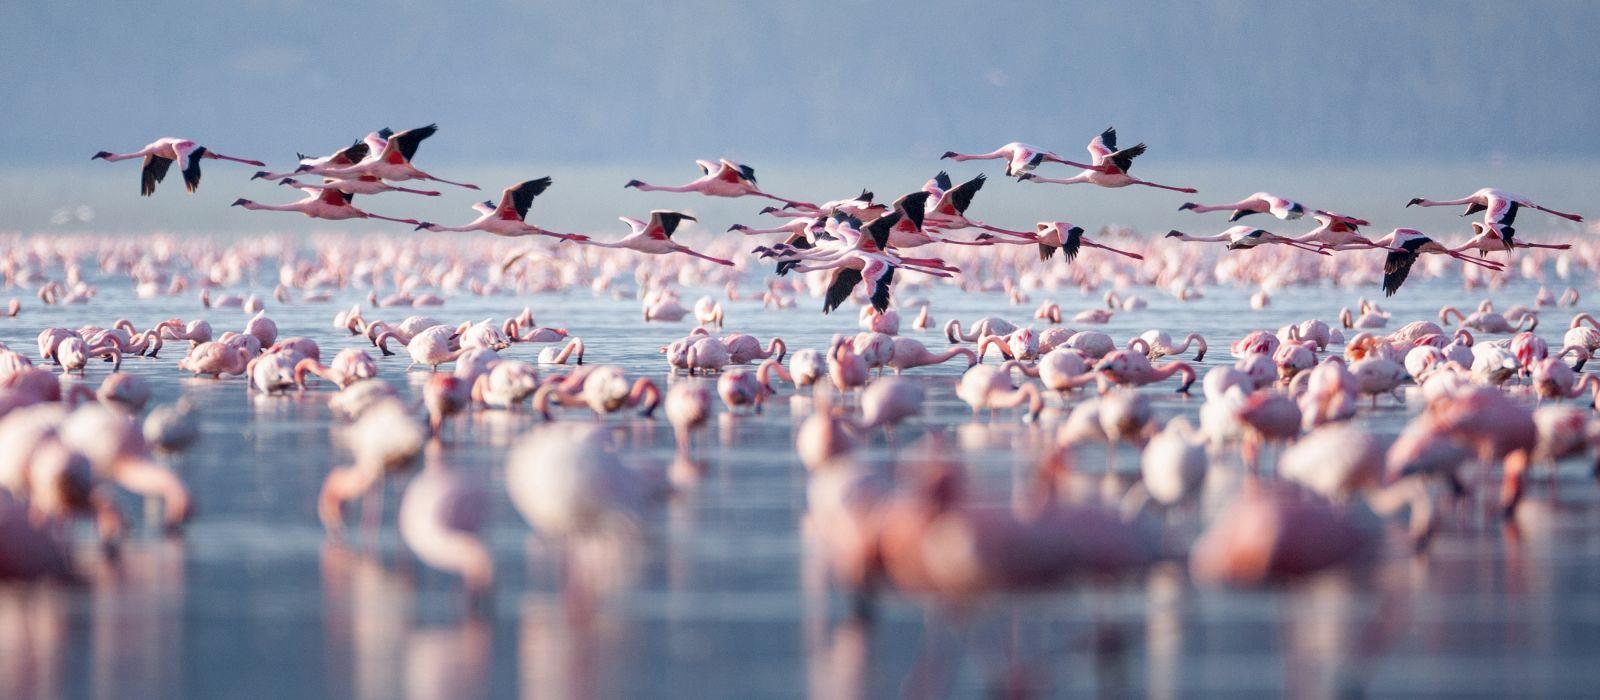 Flying flamingo in lake nakuru, Kenya, Africa